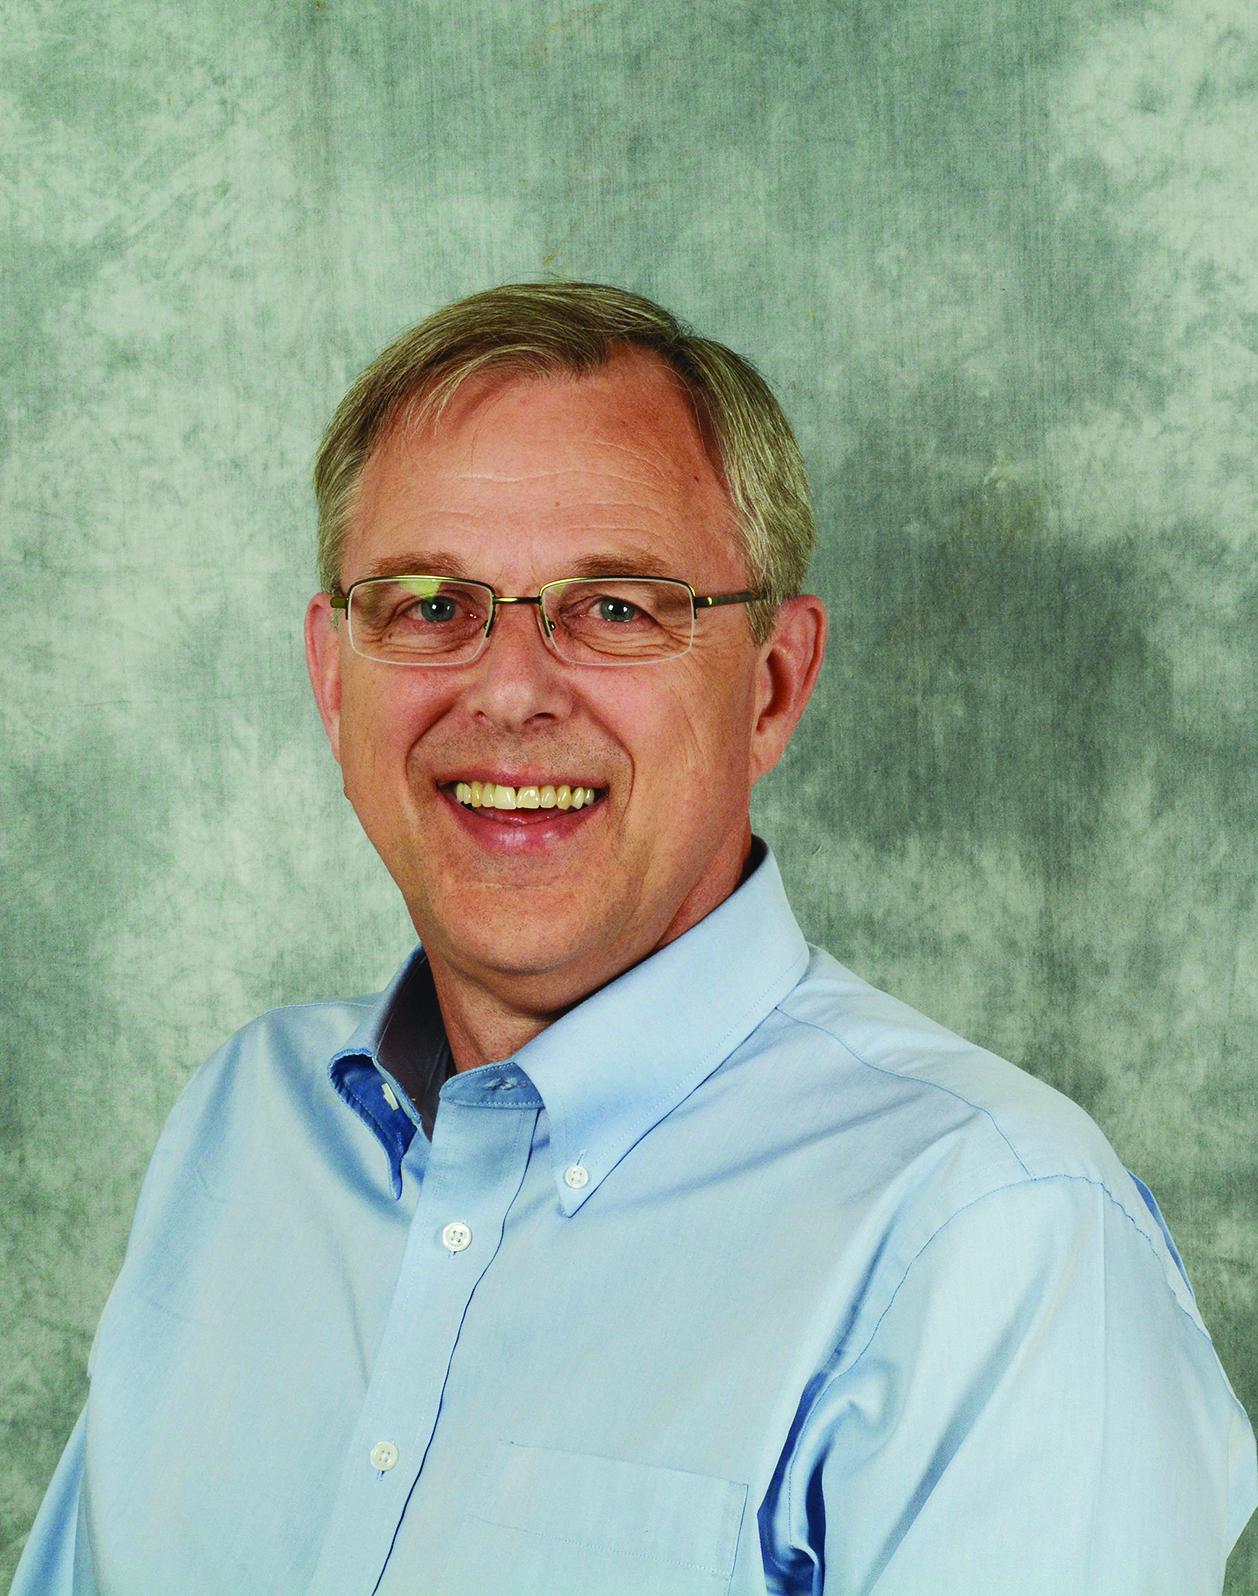 Jeff Lindoo